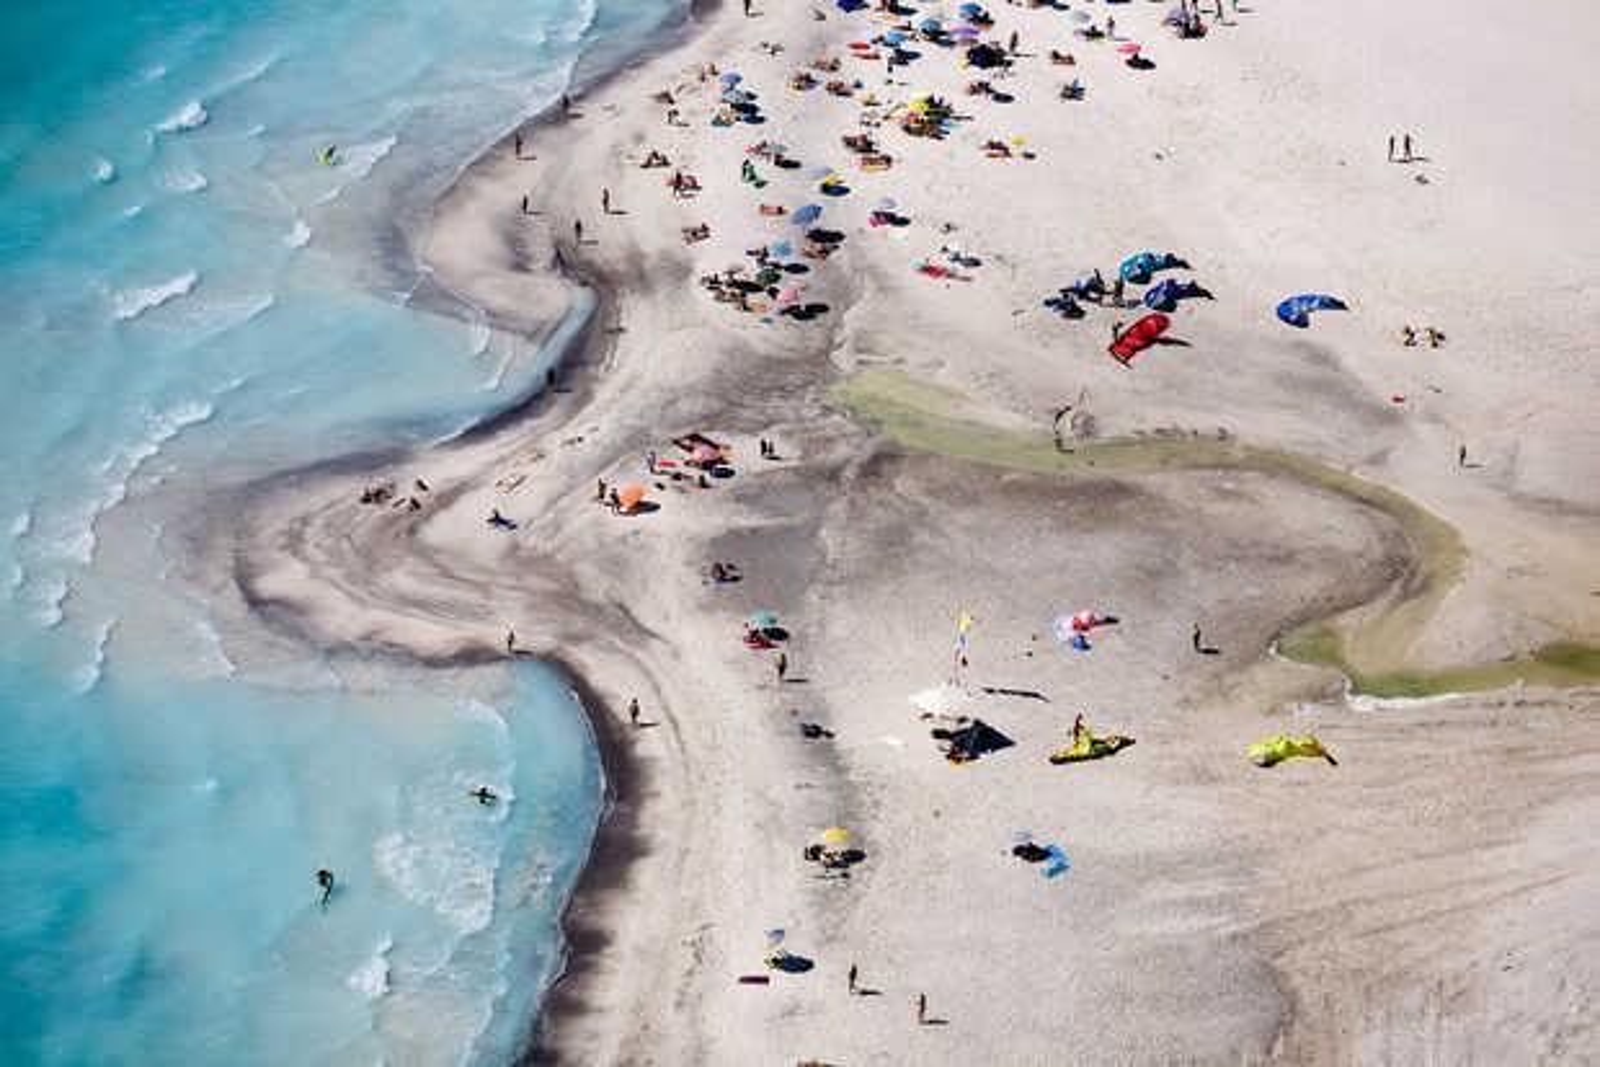 Beach goers at Rosignano Marittimo I, Italy - Alex Maclean